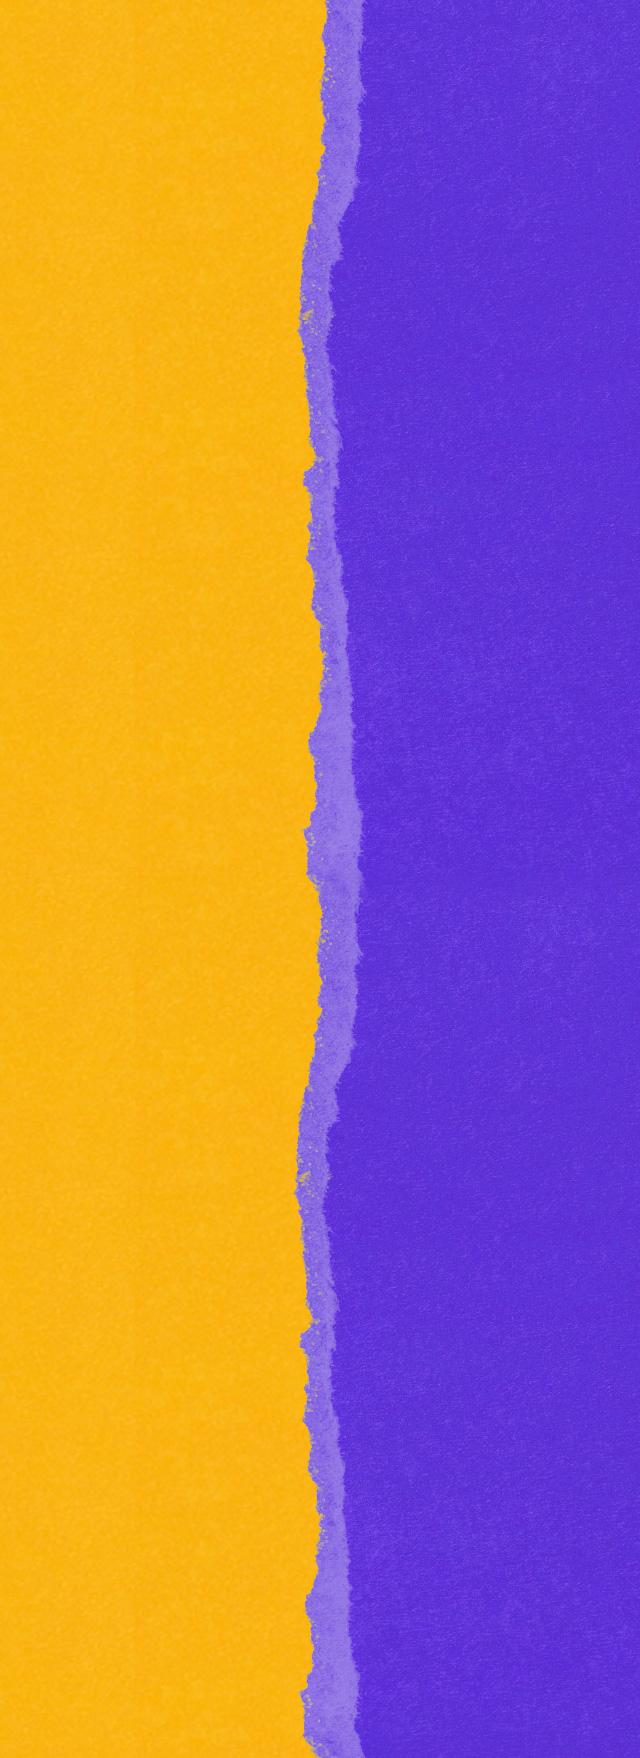 bg-paper-yellow-purple-mob